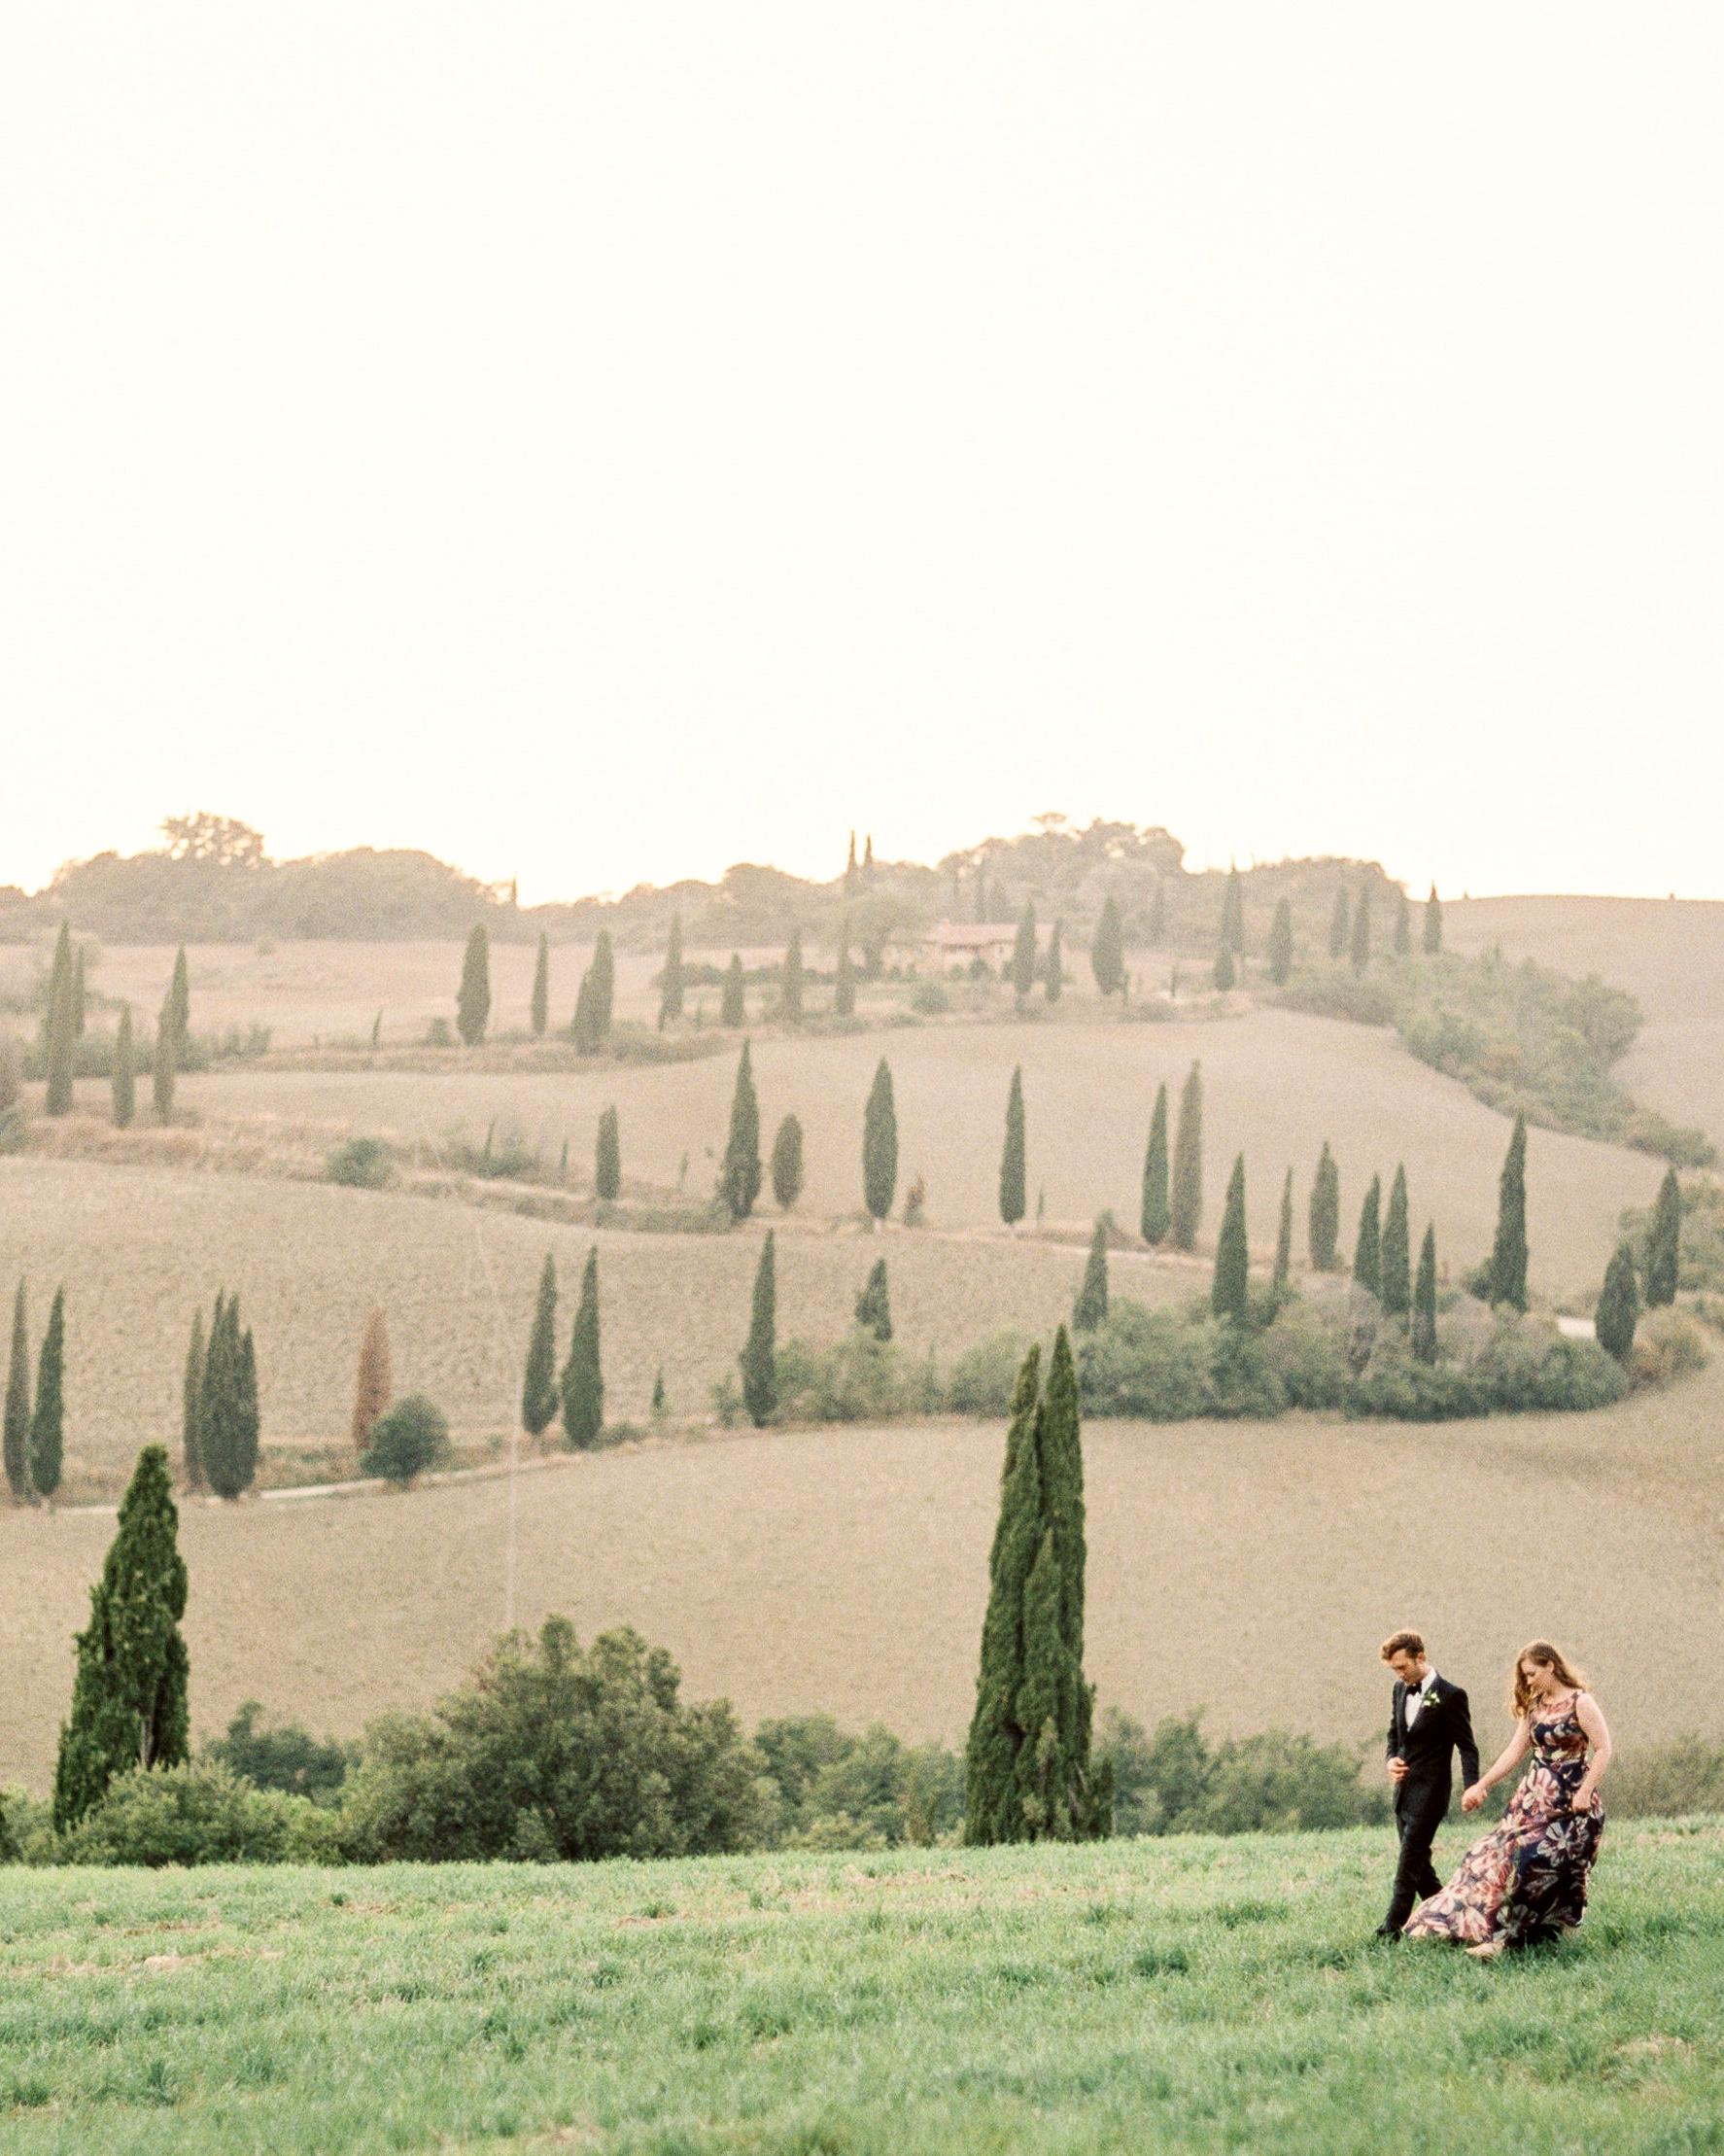 christine-dagan-wedding-couple-italy-4301_15-s113011-0616.jpg